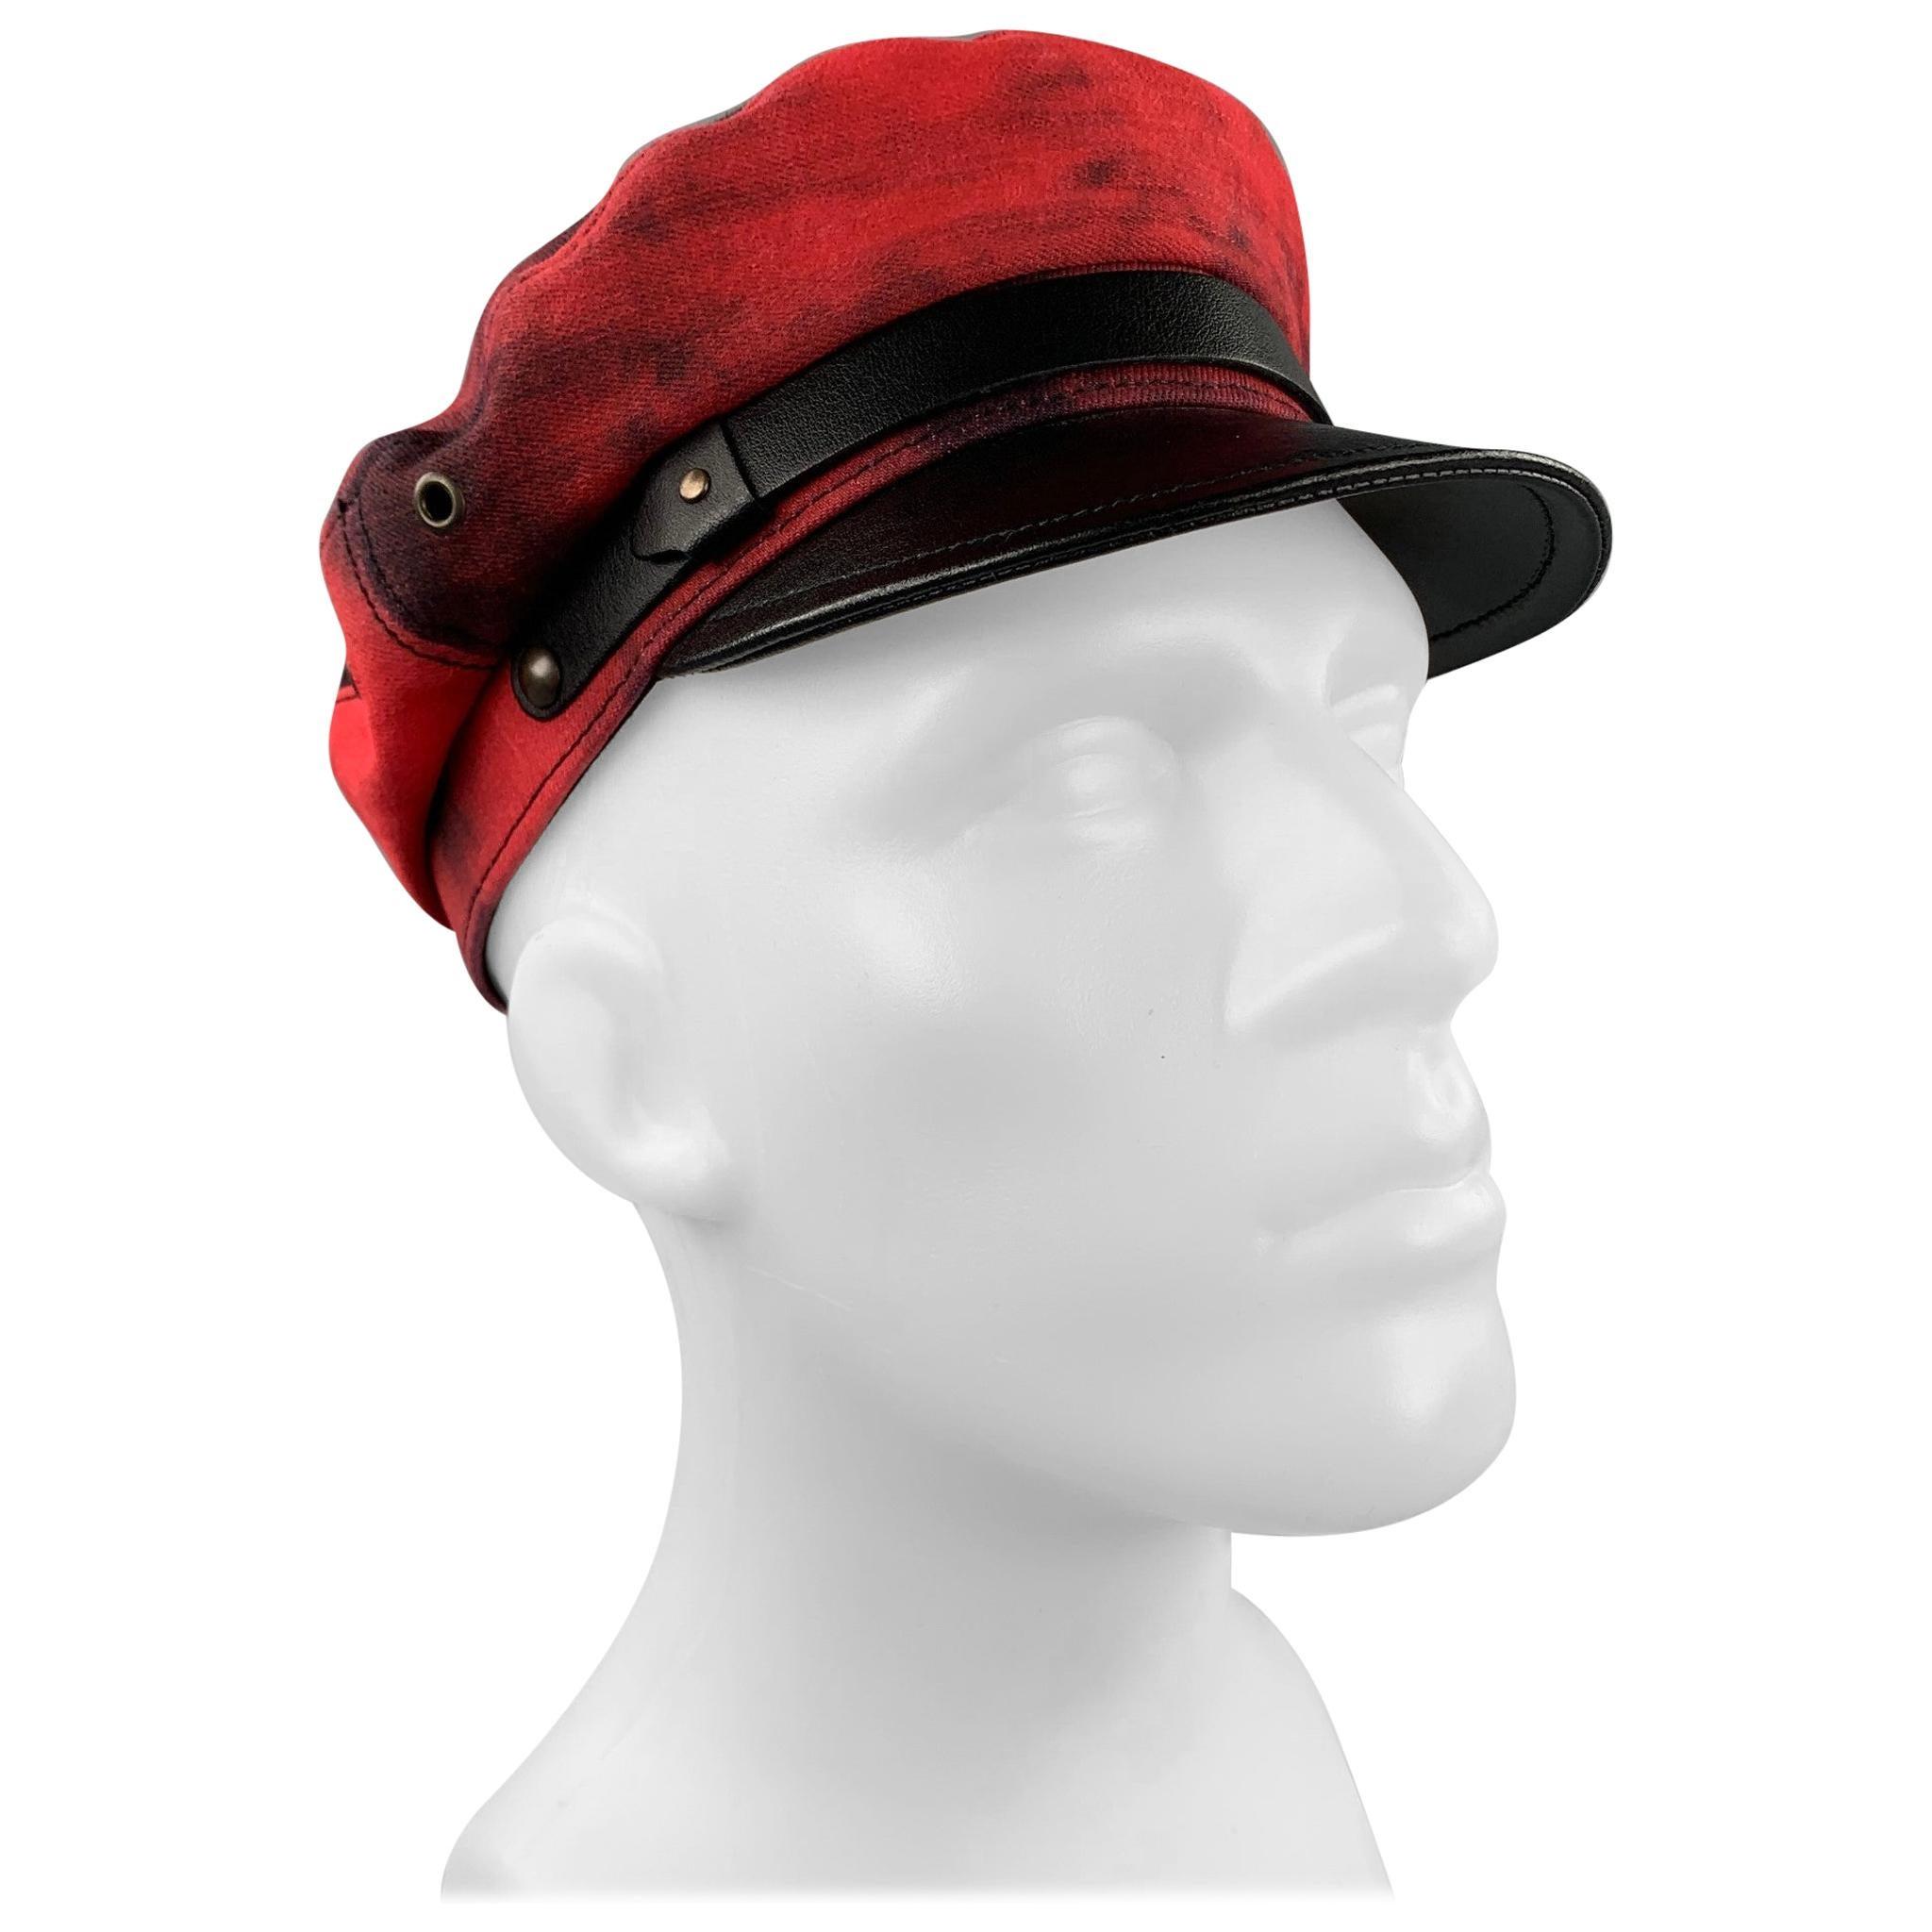 DSQUARED2 Size S Red & Black Cotton Leather Biker Hat